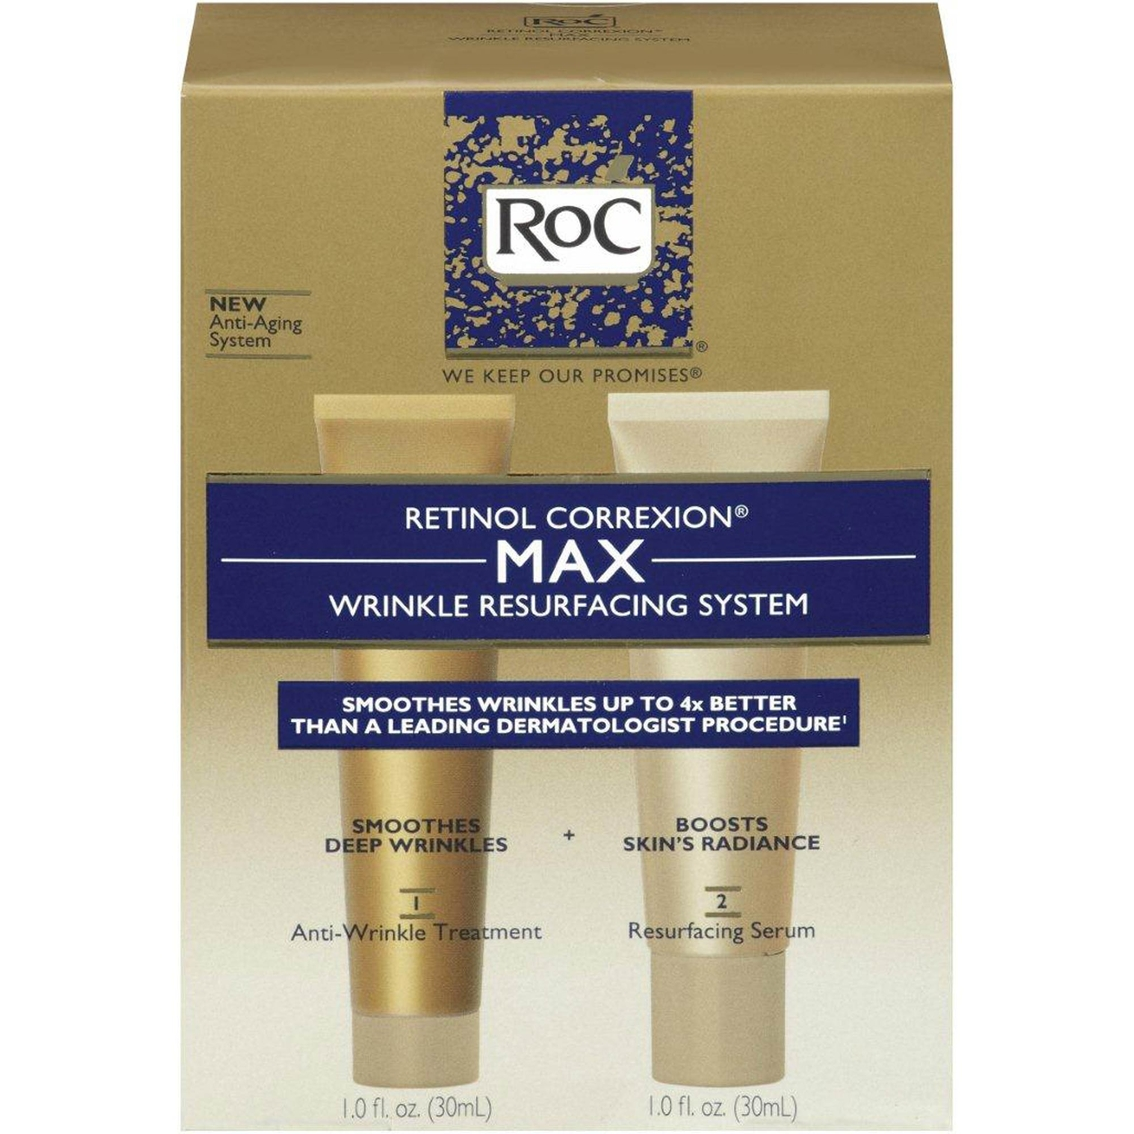 Roc Retinol Correxion Max Wrinkle Resurfacing System 2